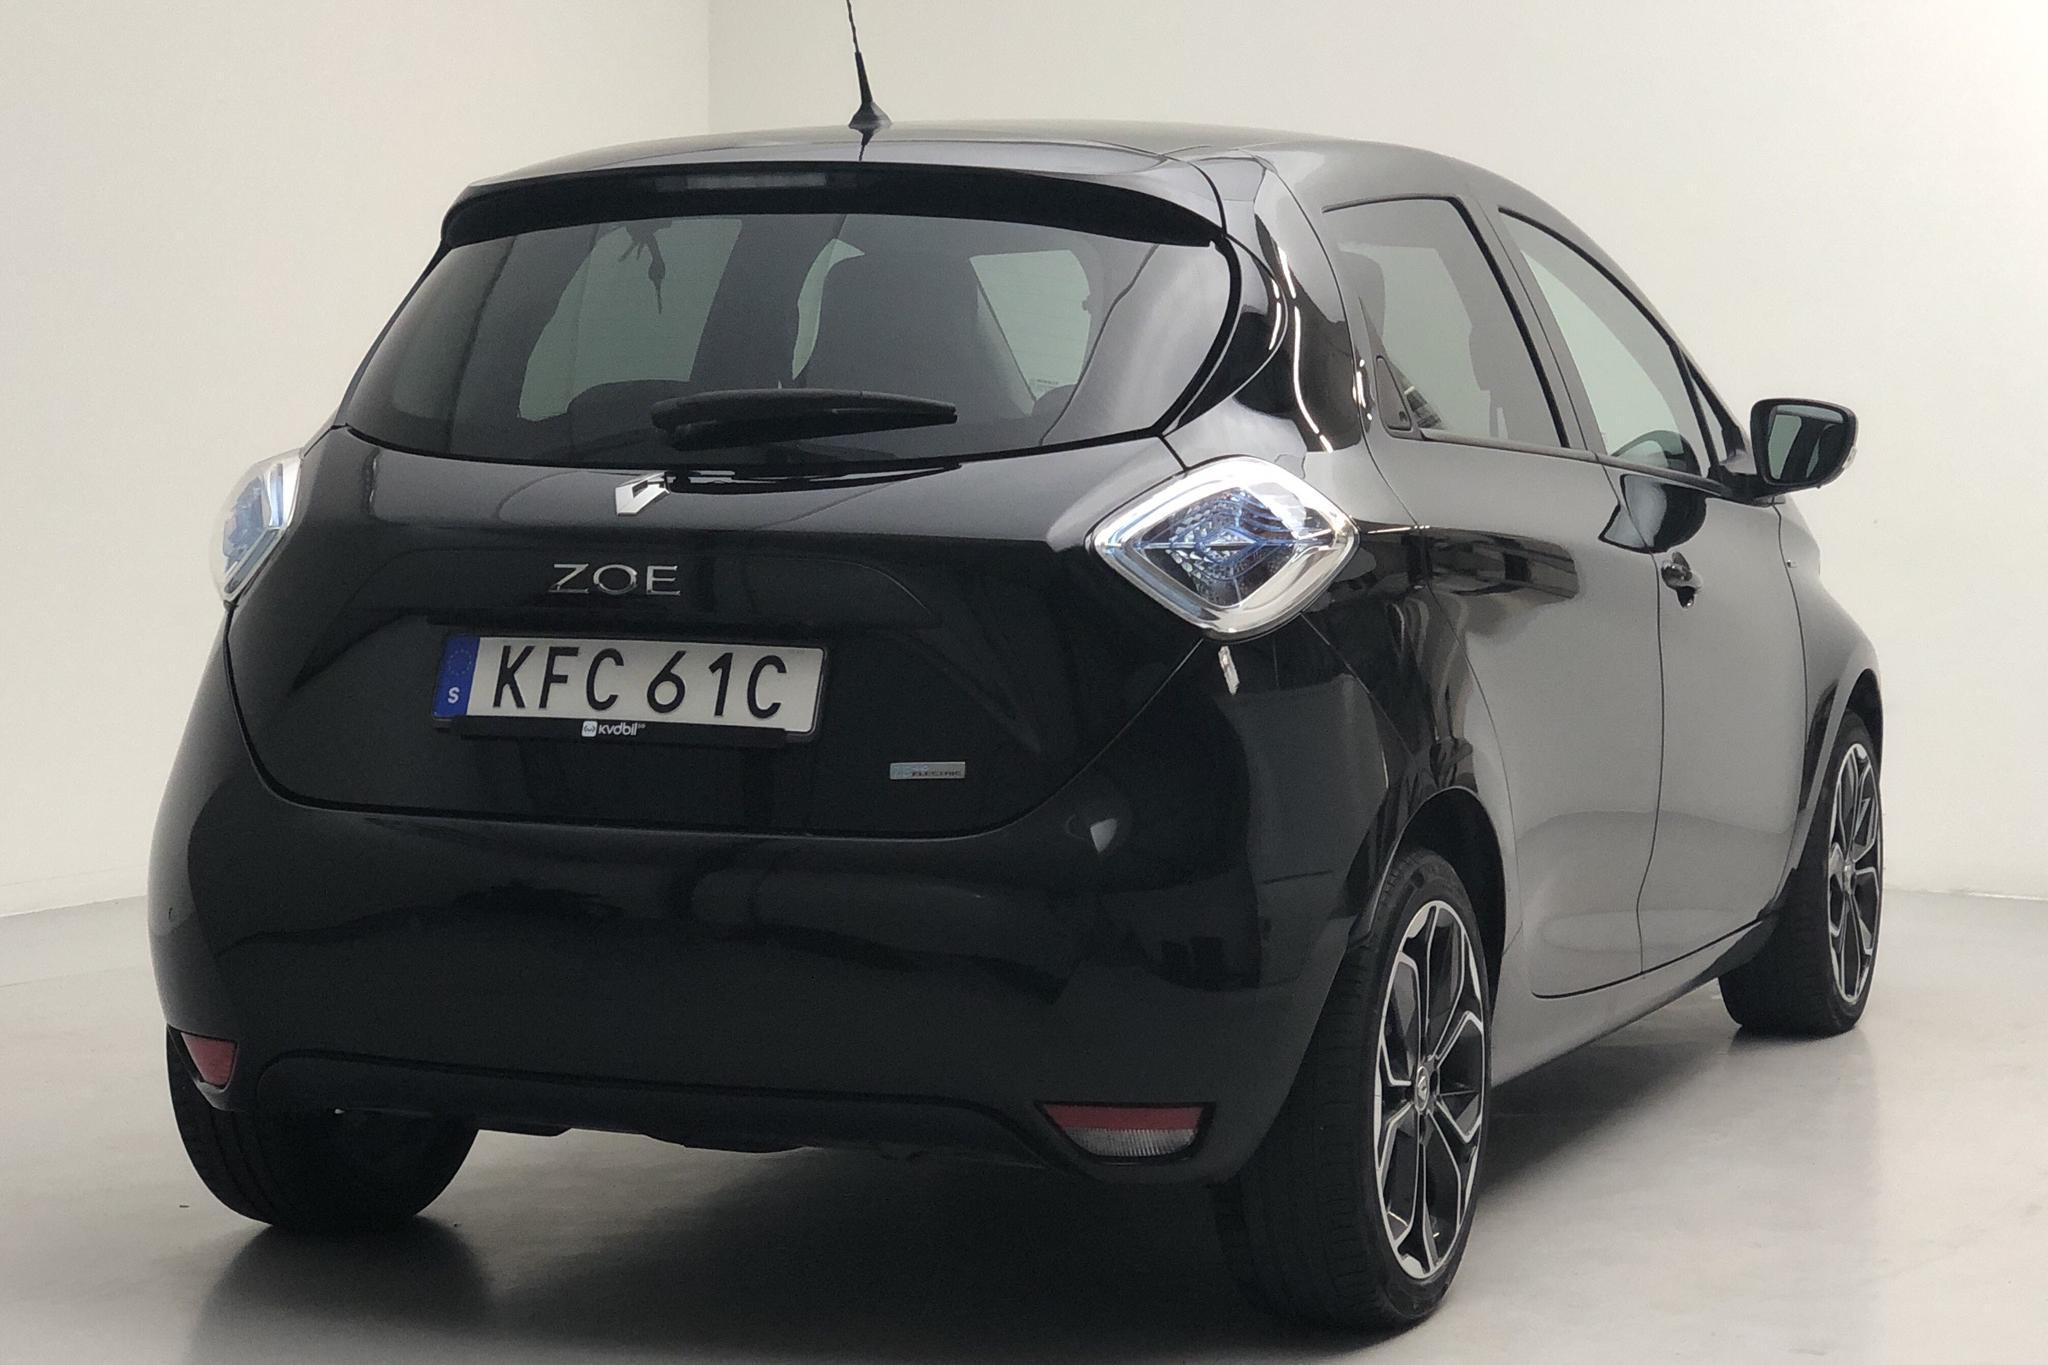 Renault Zoe 41 kWh R110 (108hk) - 52 760 km - Automatic - black - 2019